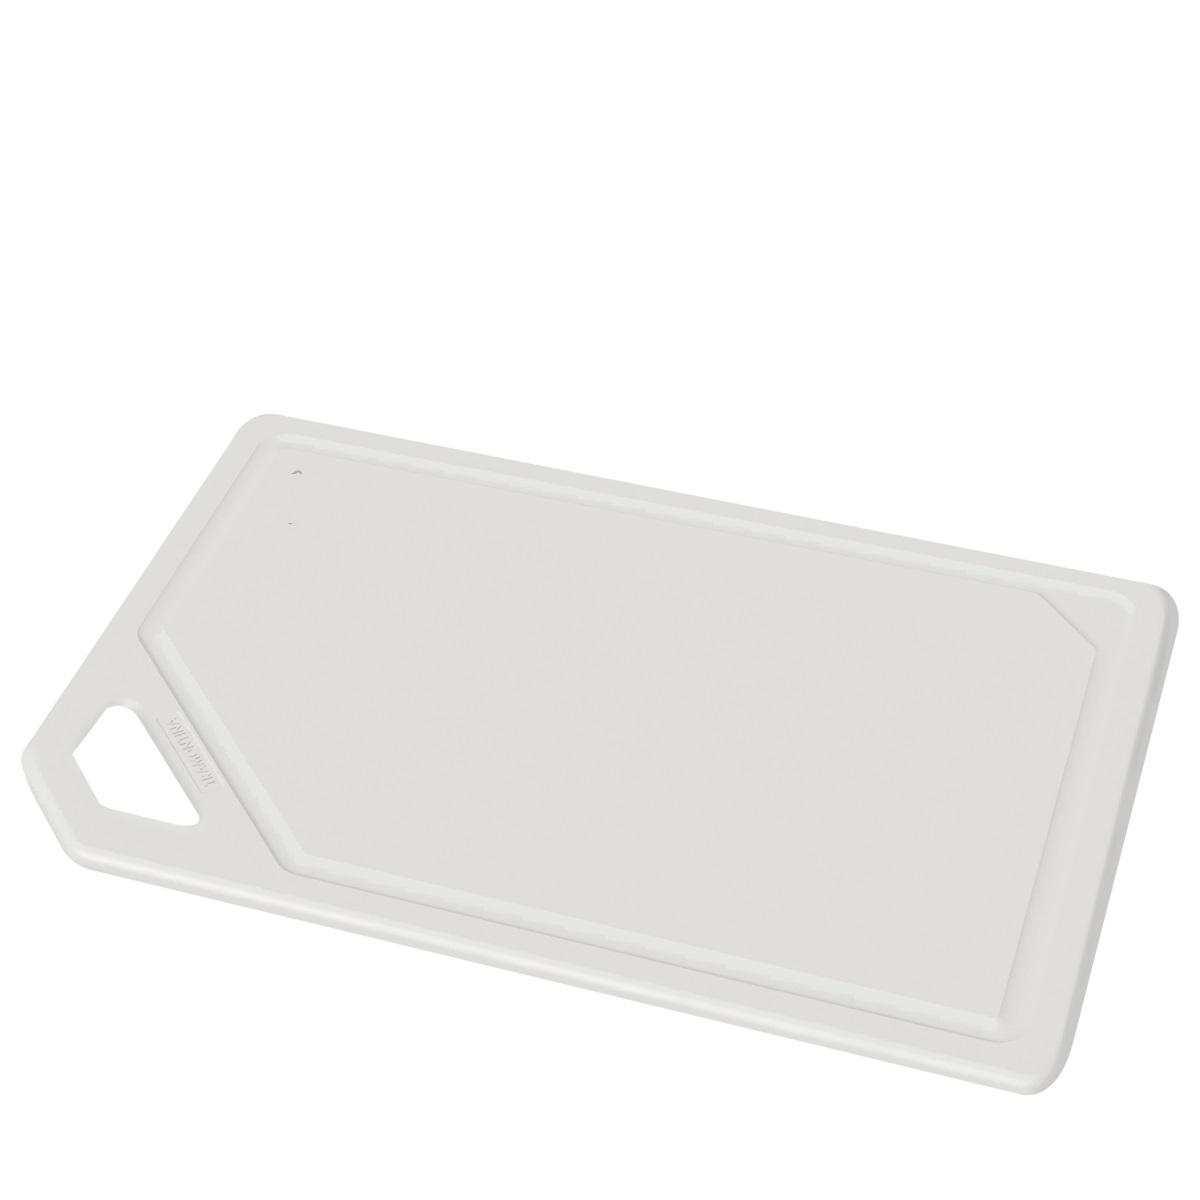 Tábua de Corte Mixcolor Polipropileno Branco Tramontina 29 x 20 cm